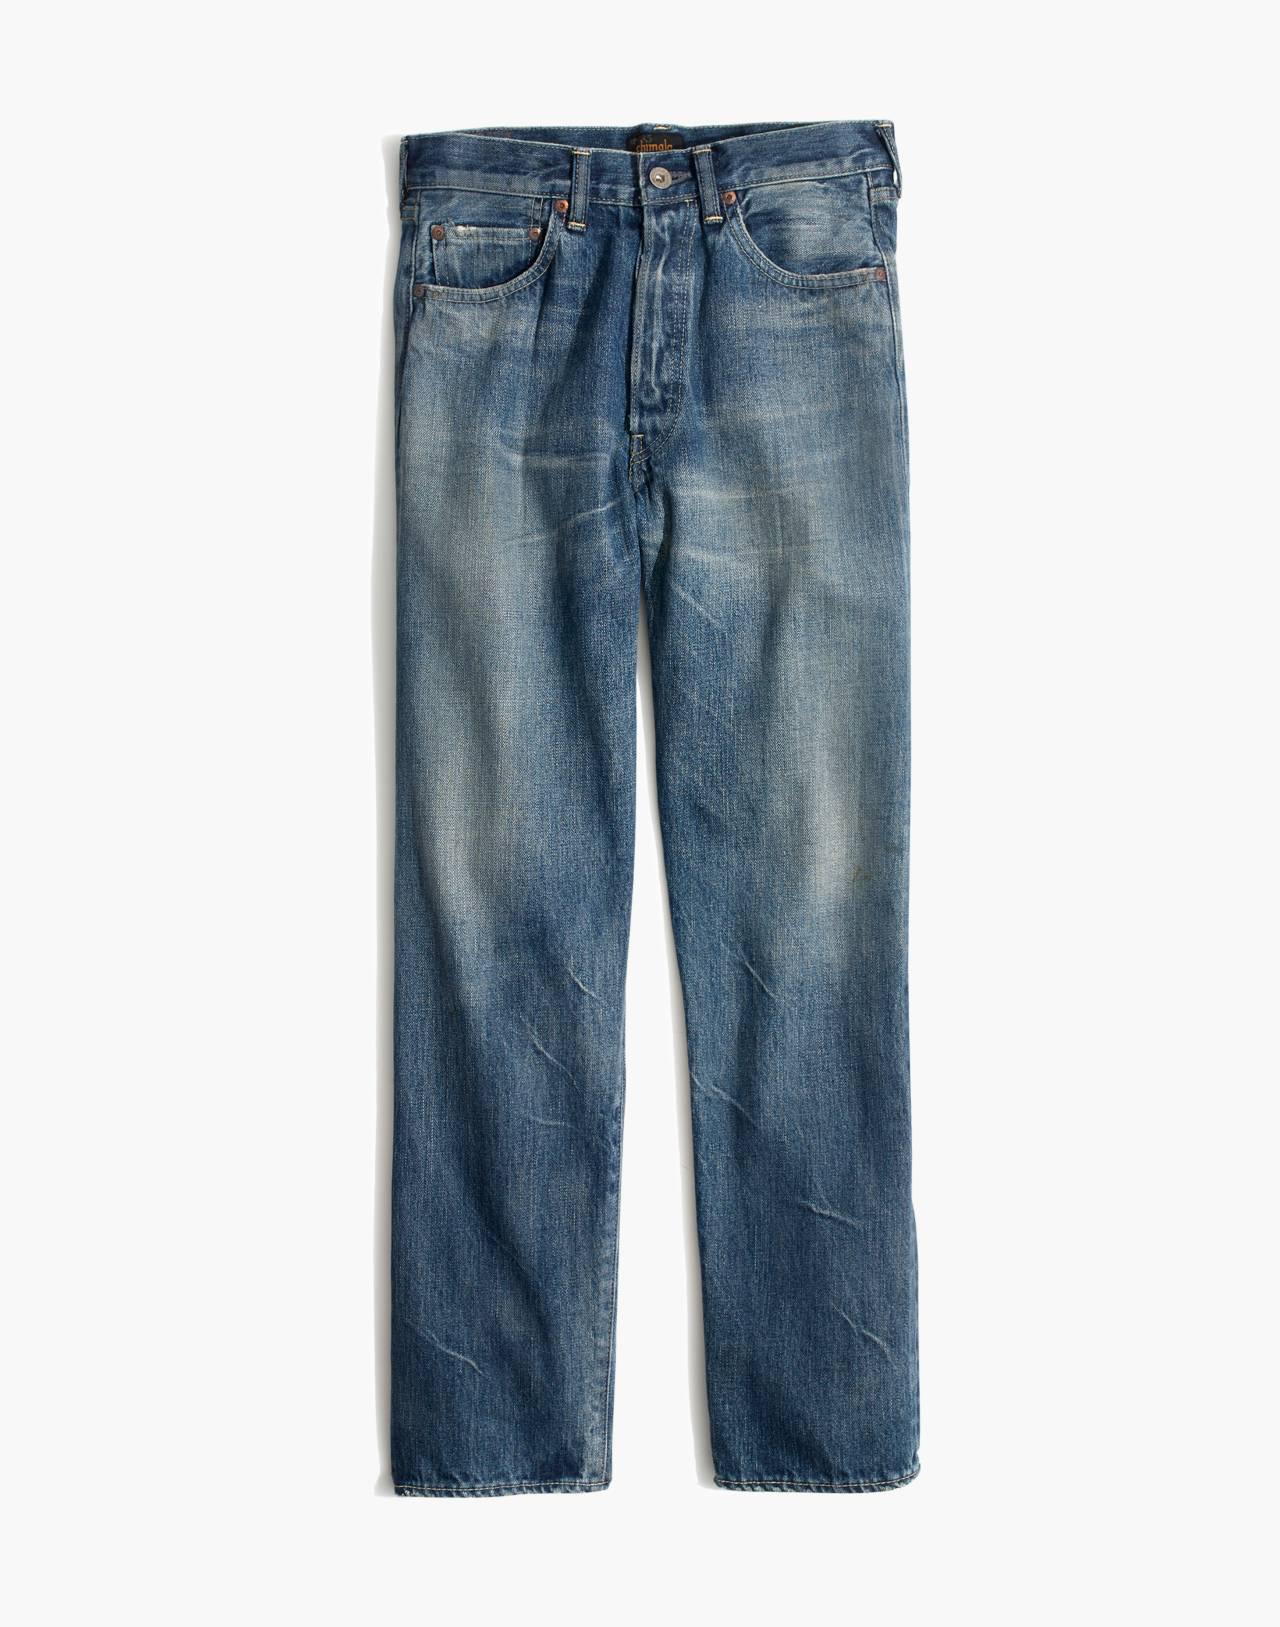 Chimala® Selvedge Straight Cut Jeans in medium vintage image 1